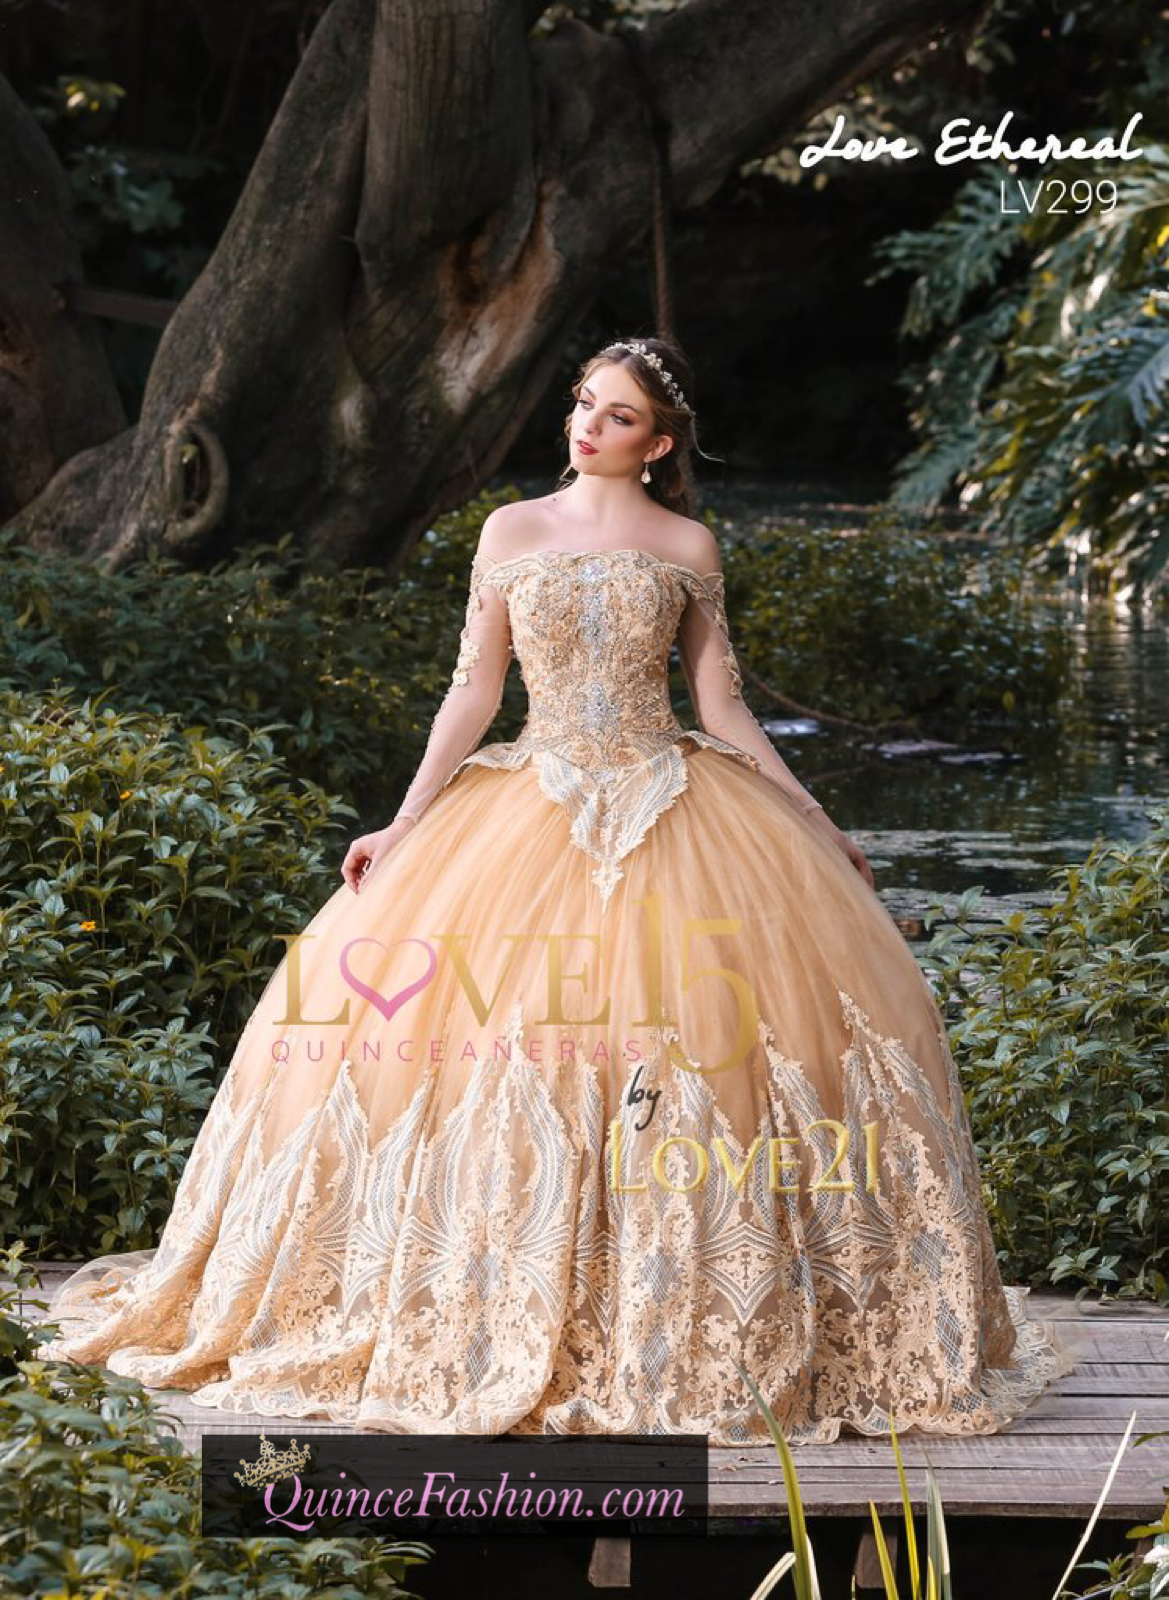 f302260d7c8 Quinceañera dress LV299 Love 21